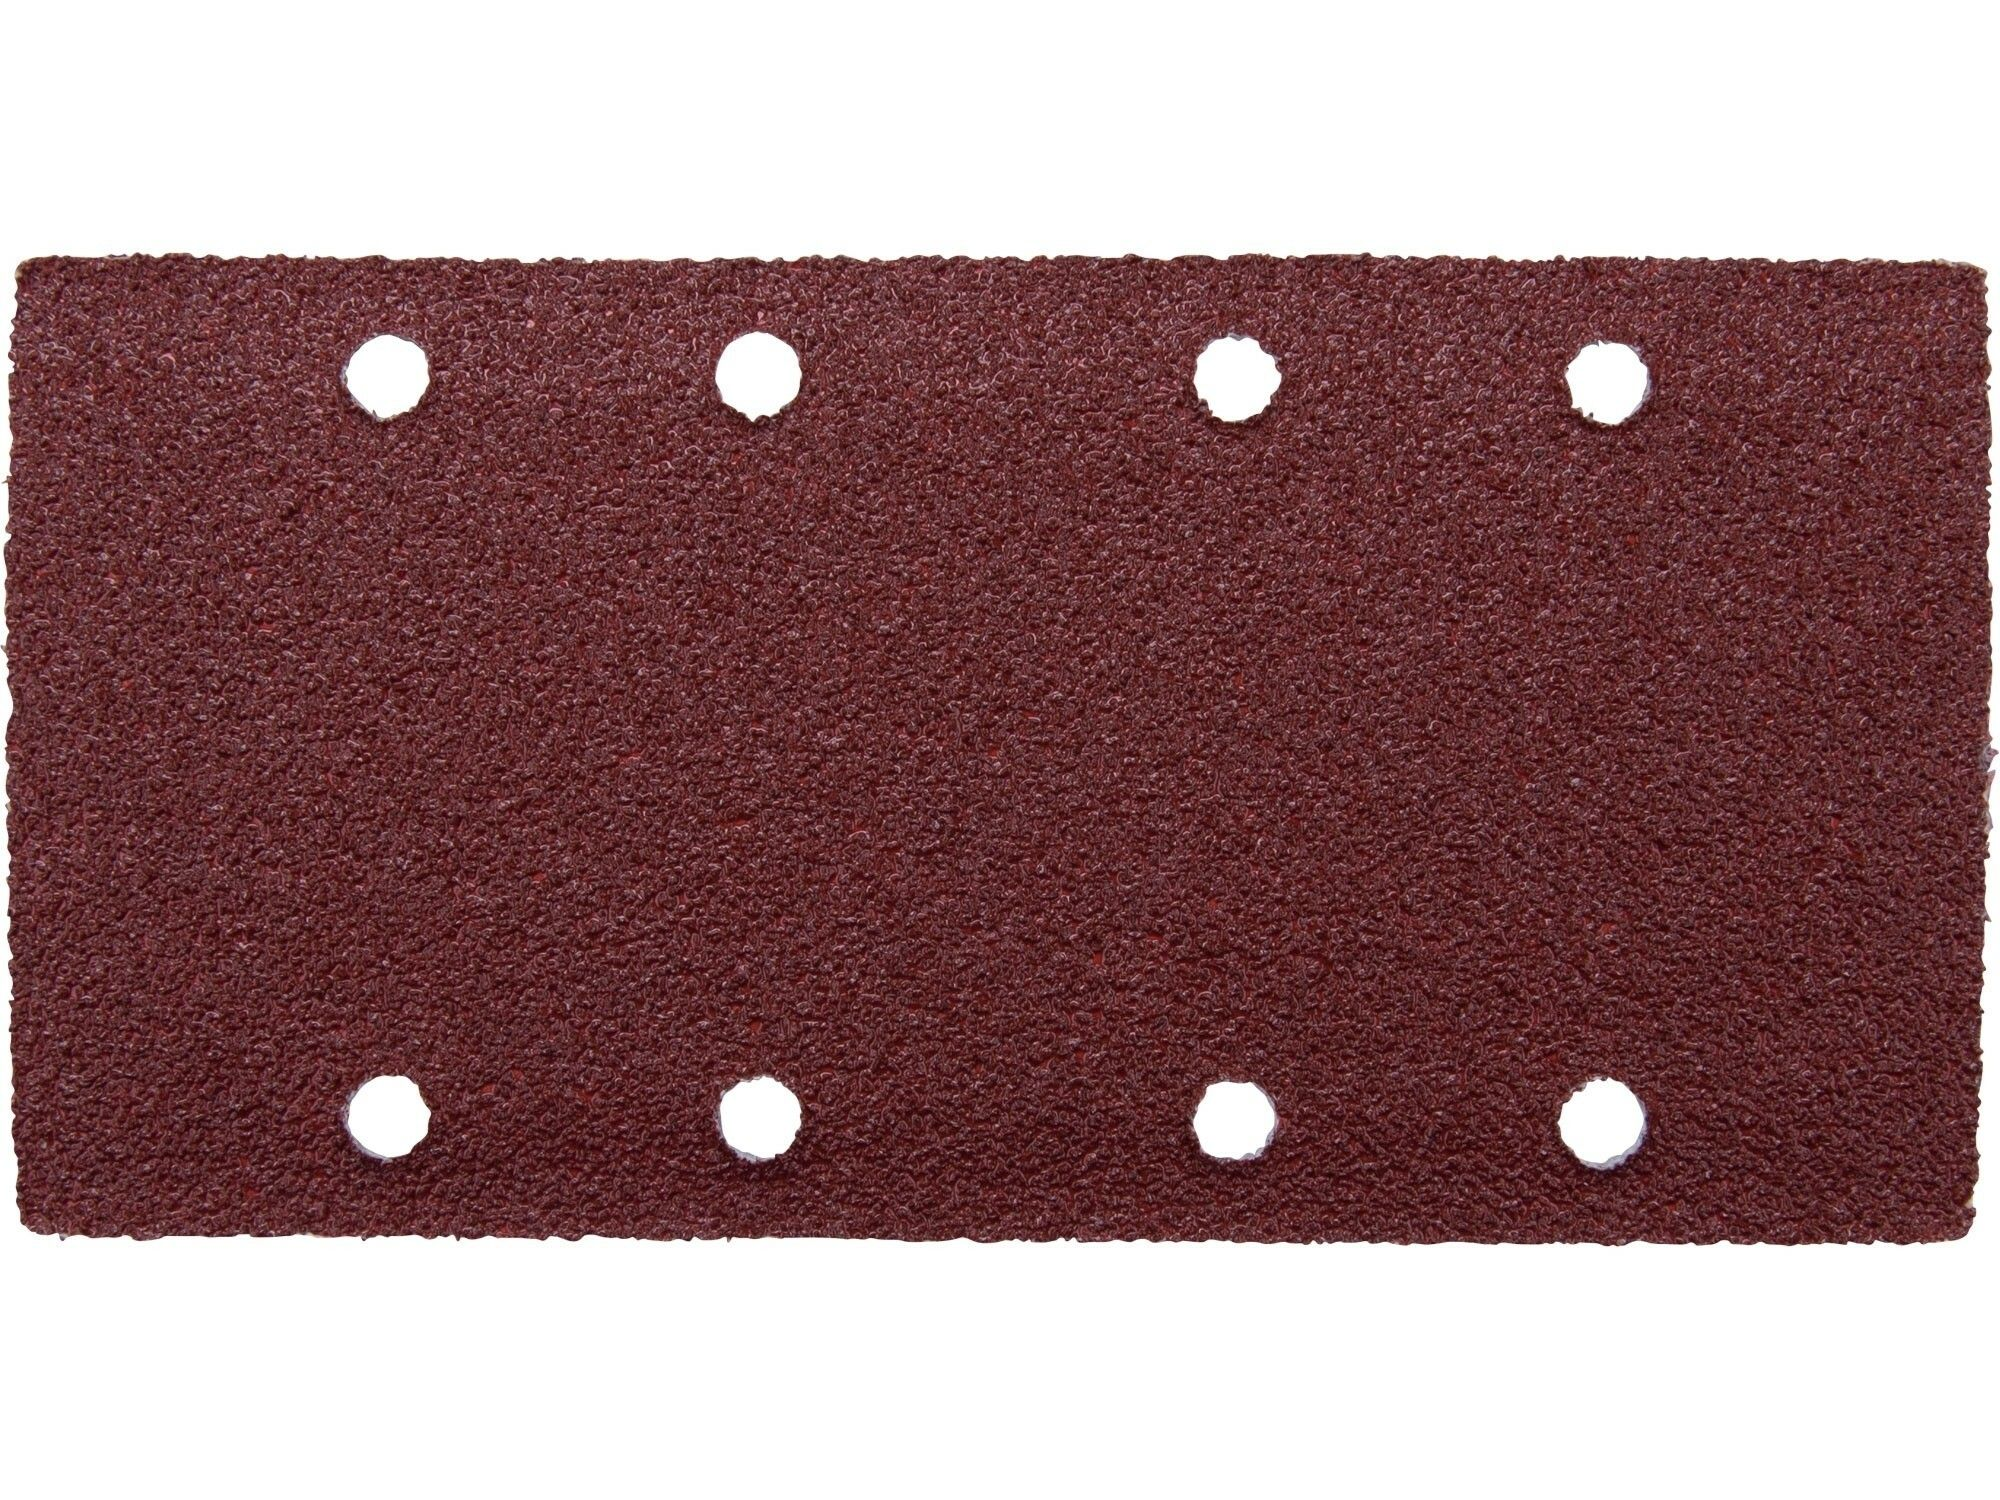 Papíry brusné, suchý zip, bal. 10ks, 185x93mm, P100 EXTOL-PREMIUM